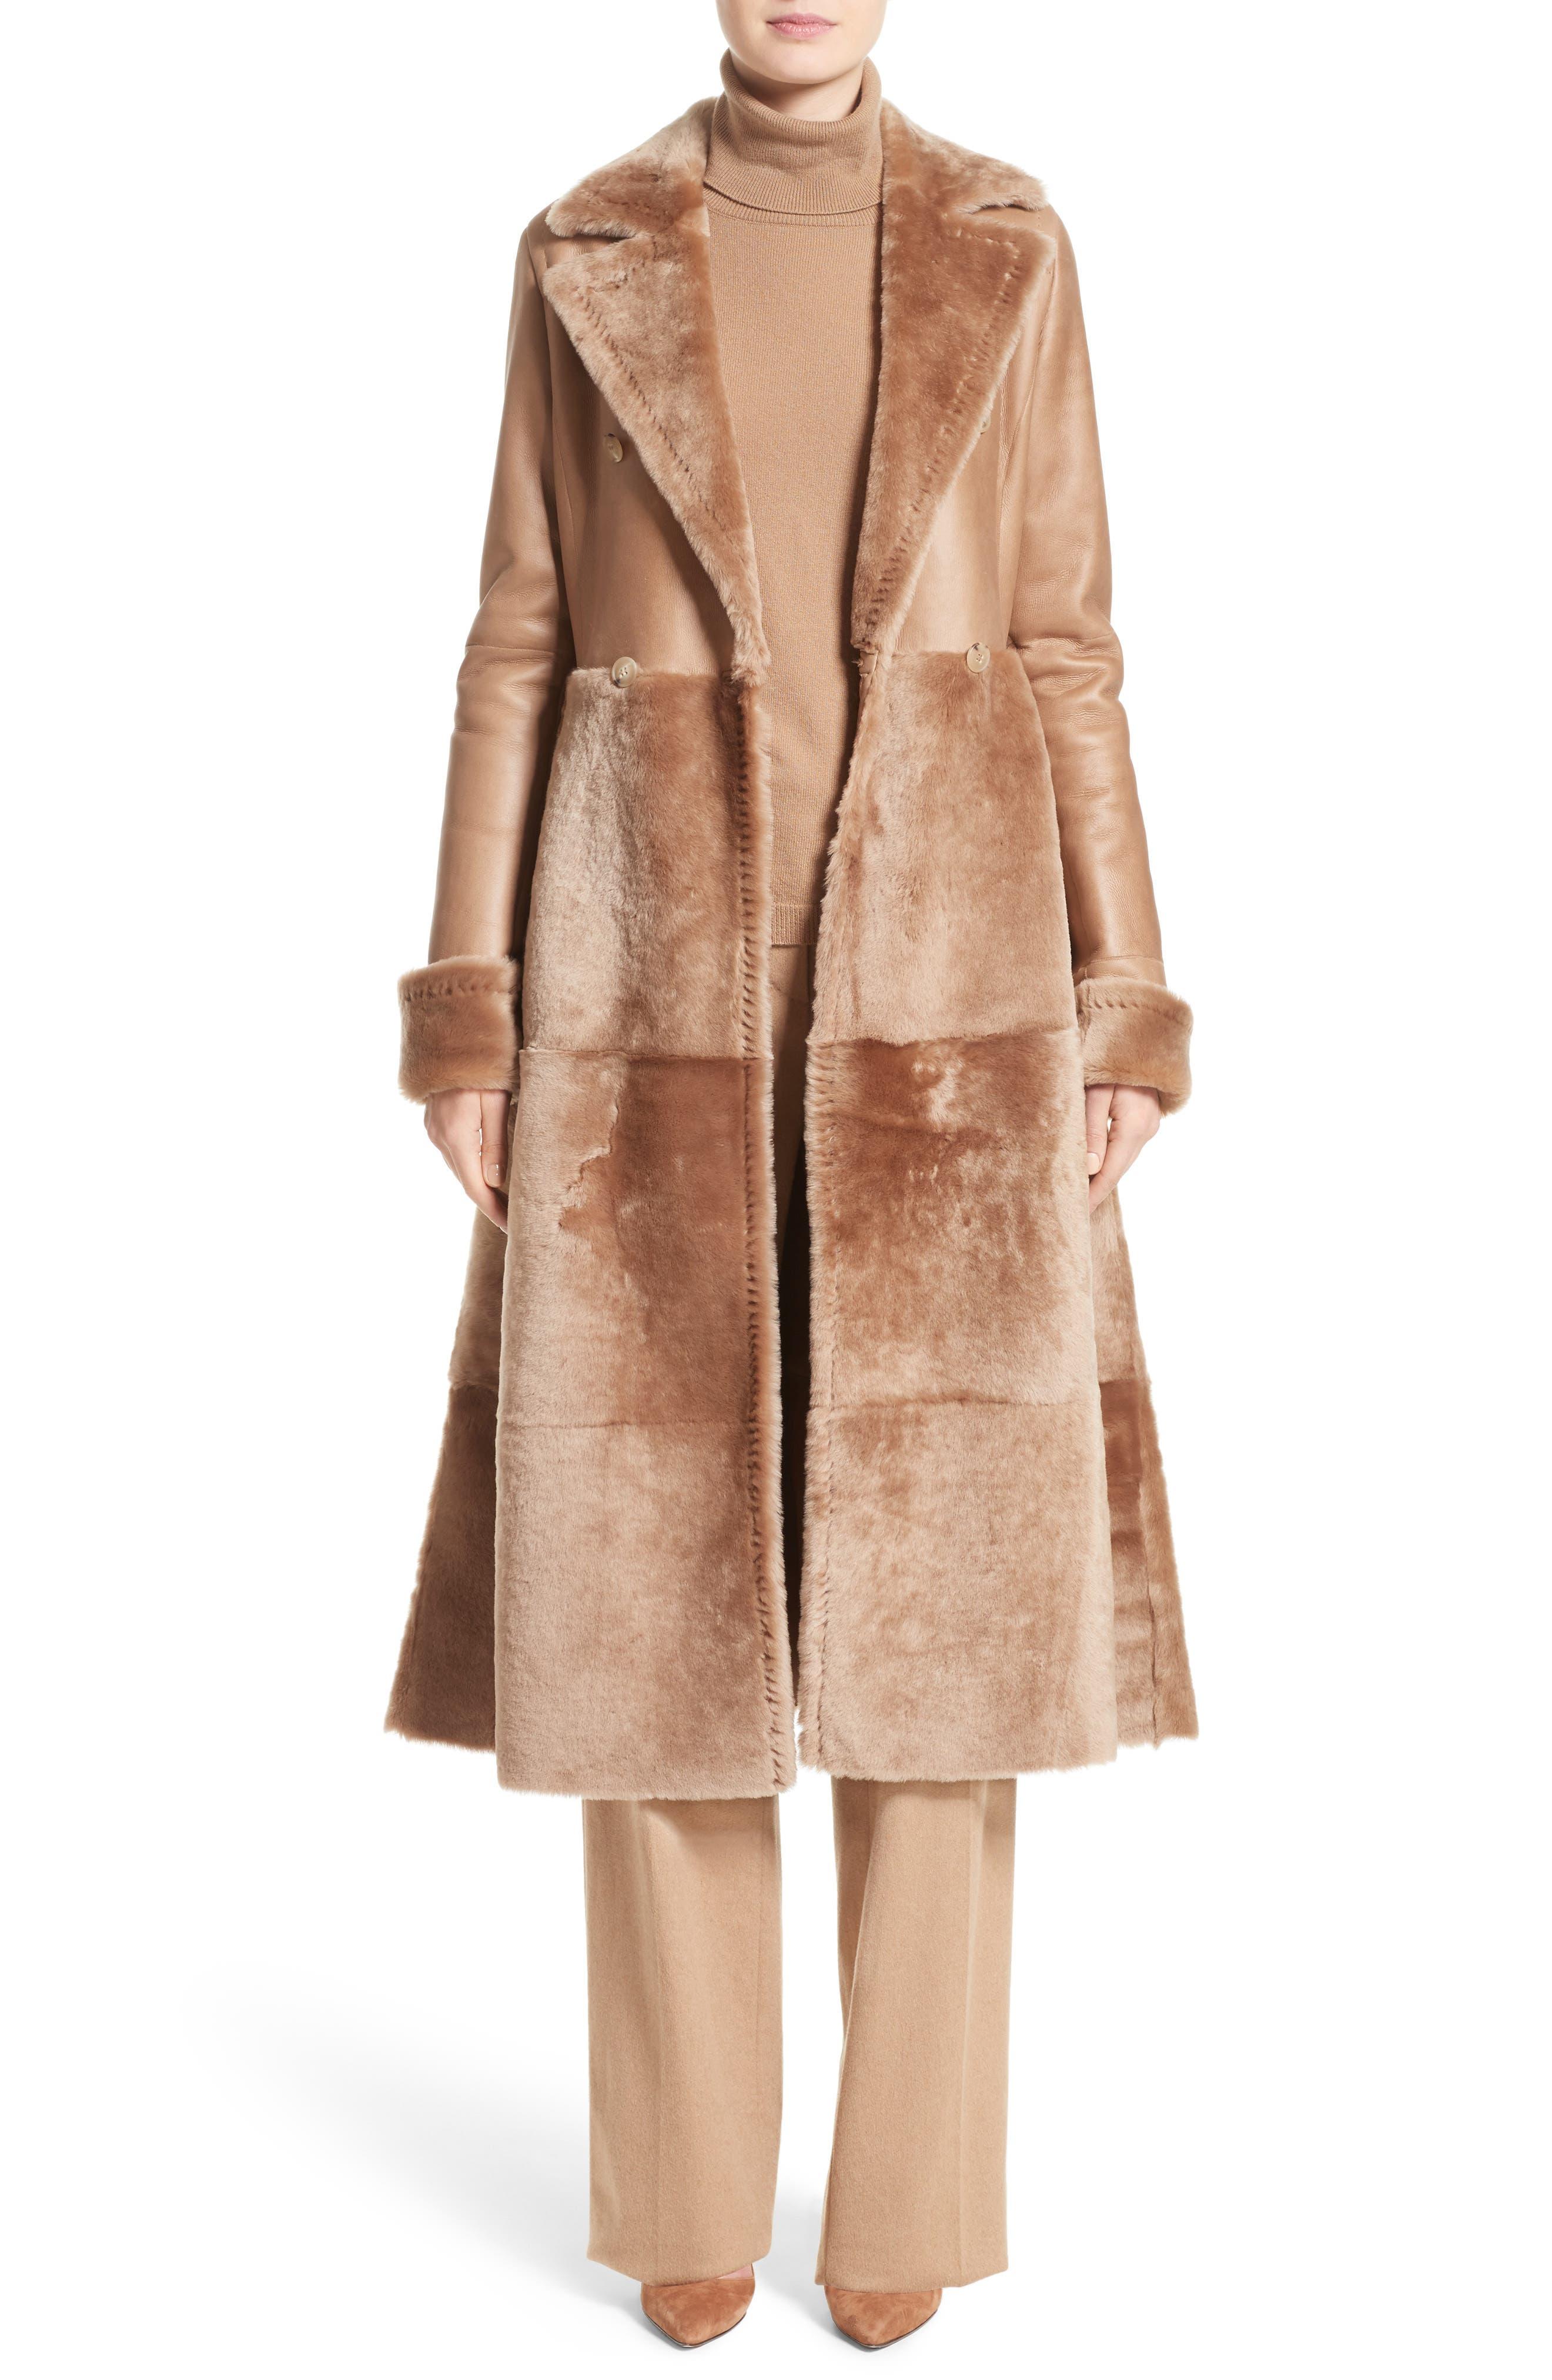 MAX MARA, Rimini Genuine Shearling Coat, Alternate thumbnail 7, color, CAMEL